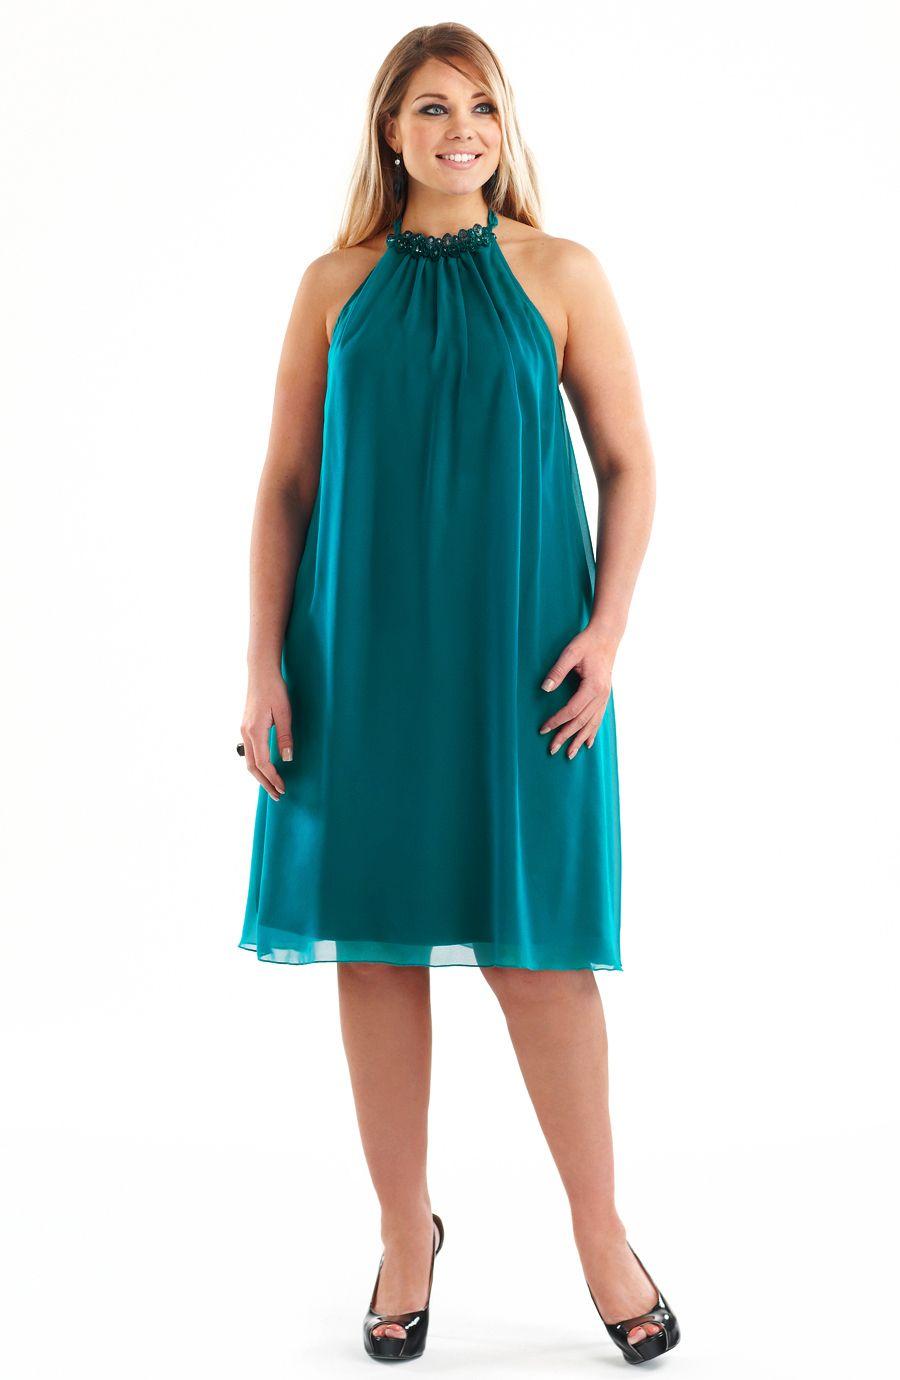 Dresses - Evening Dresses - Plus Size Larger Sizes Womens Clothing ...